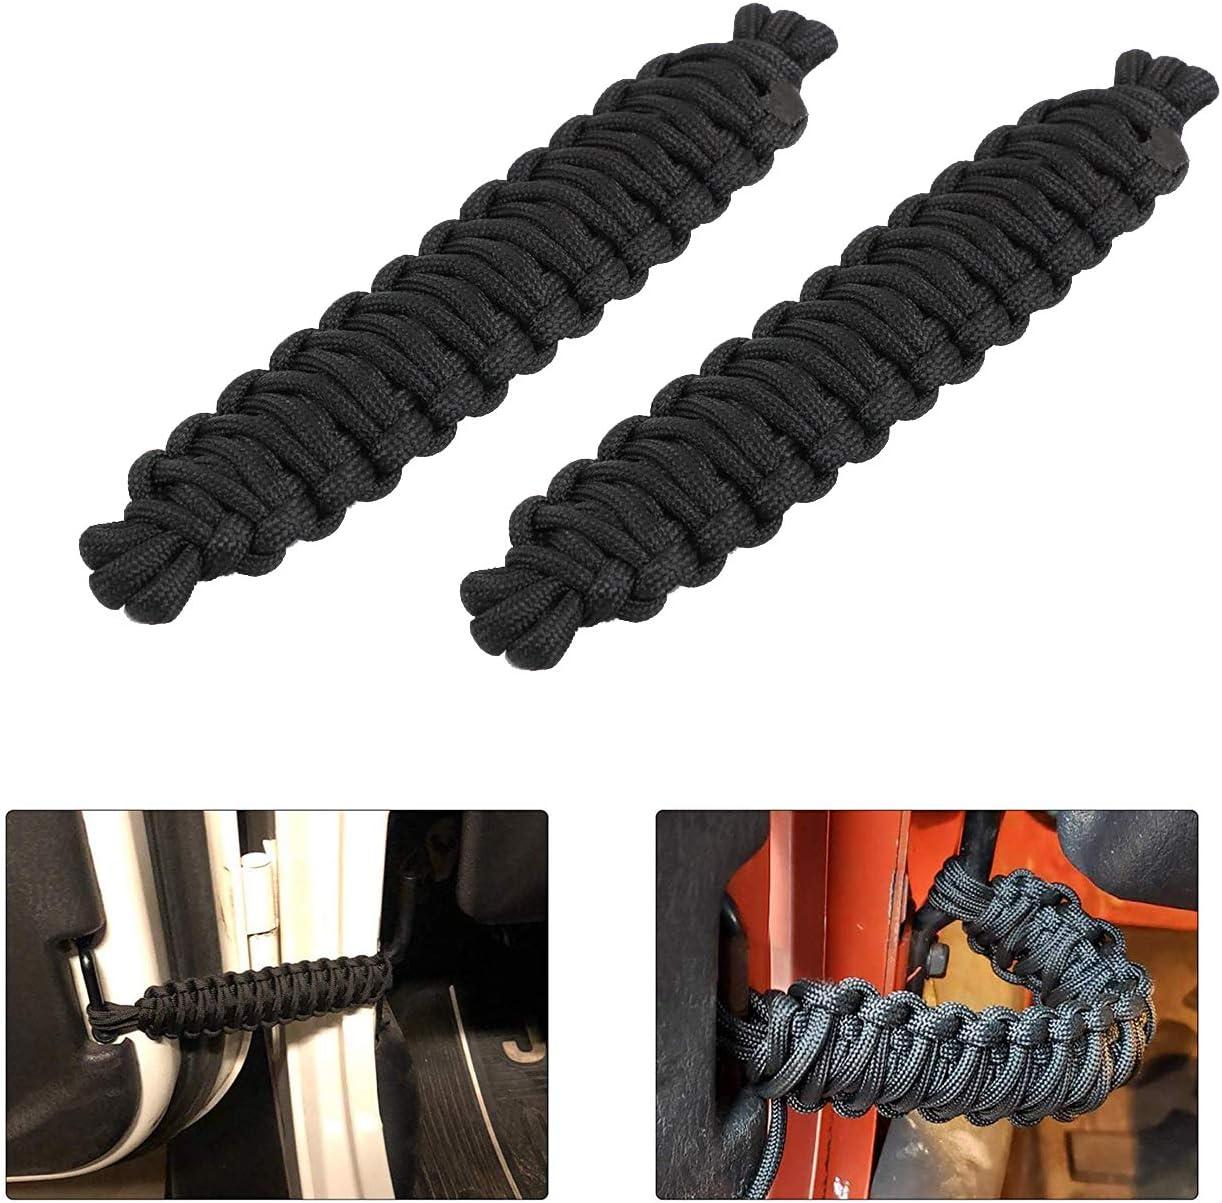 2pcs Door Limiting Straps for Jeep Wrangler Door Straps CJ YJ TJ JK JKU JL Door Limiter Paracord Hand Woven Black /& Red